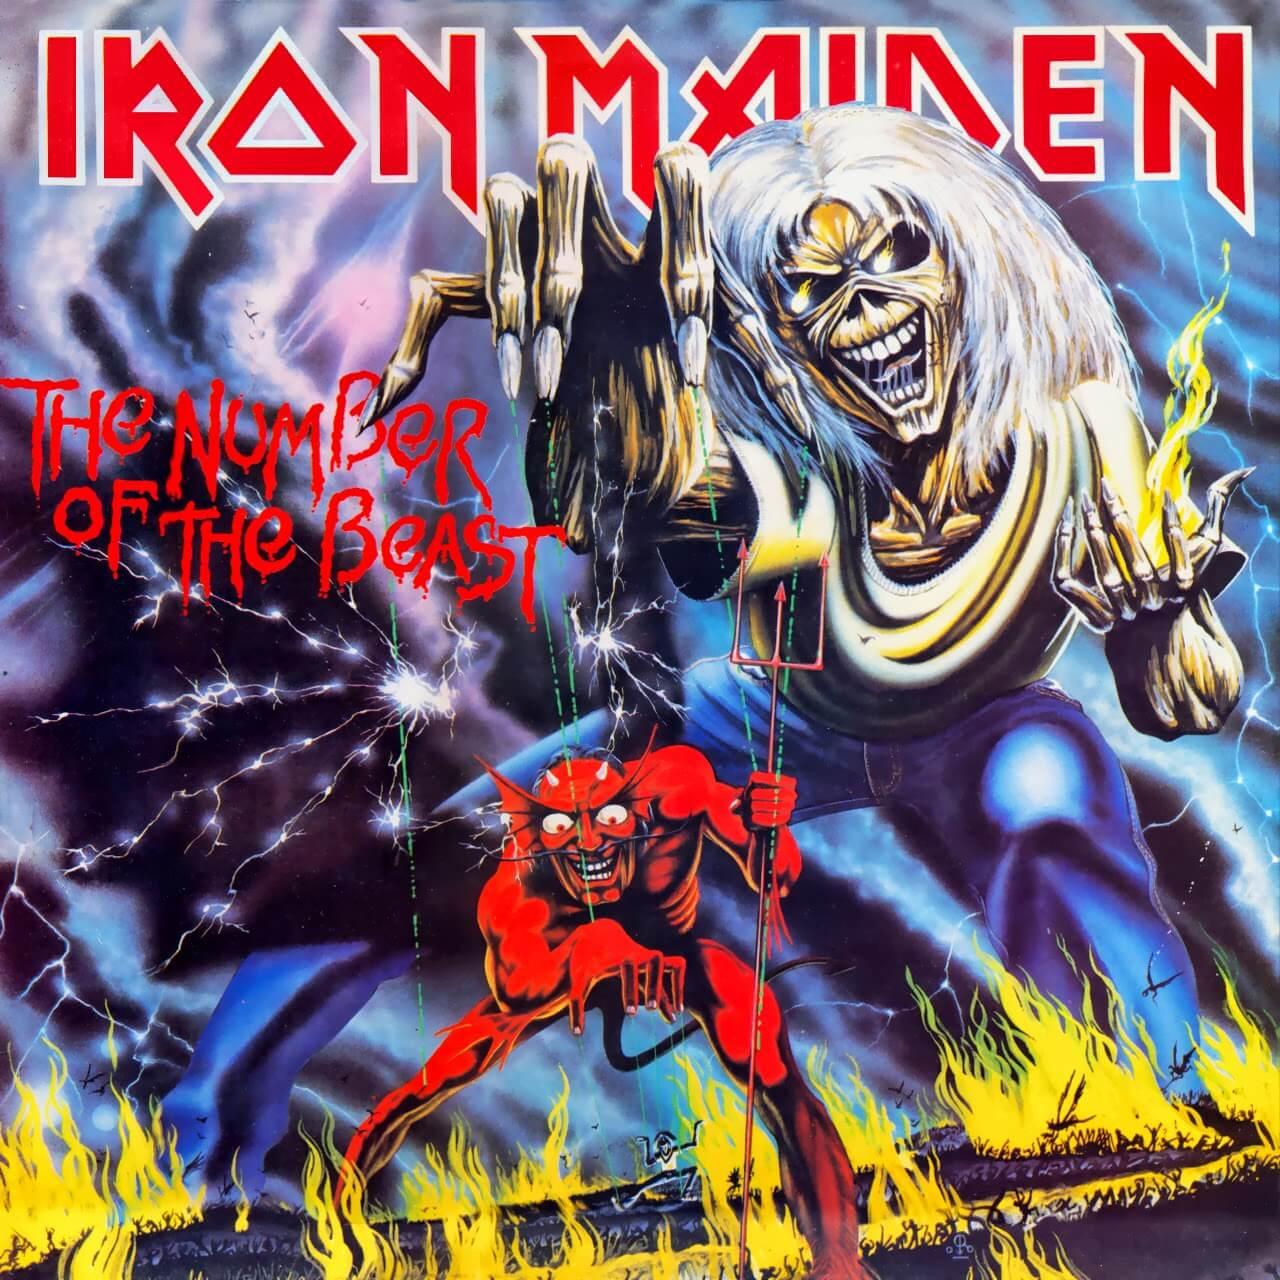 the-number-of-the-beast-1982-album-cover-full.jpg